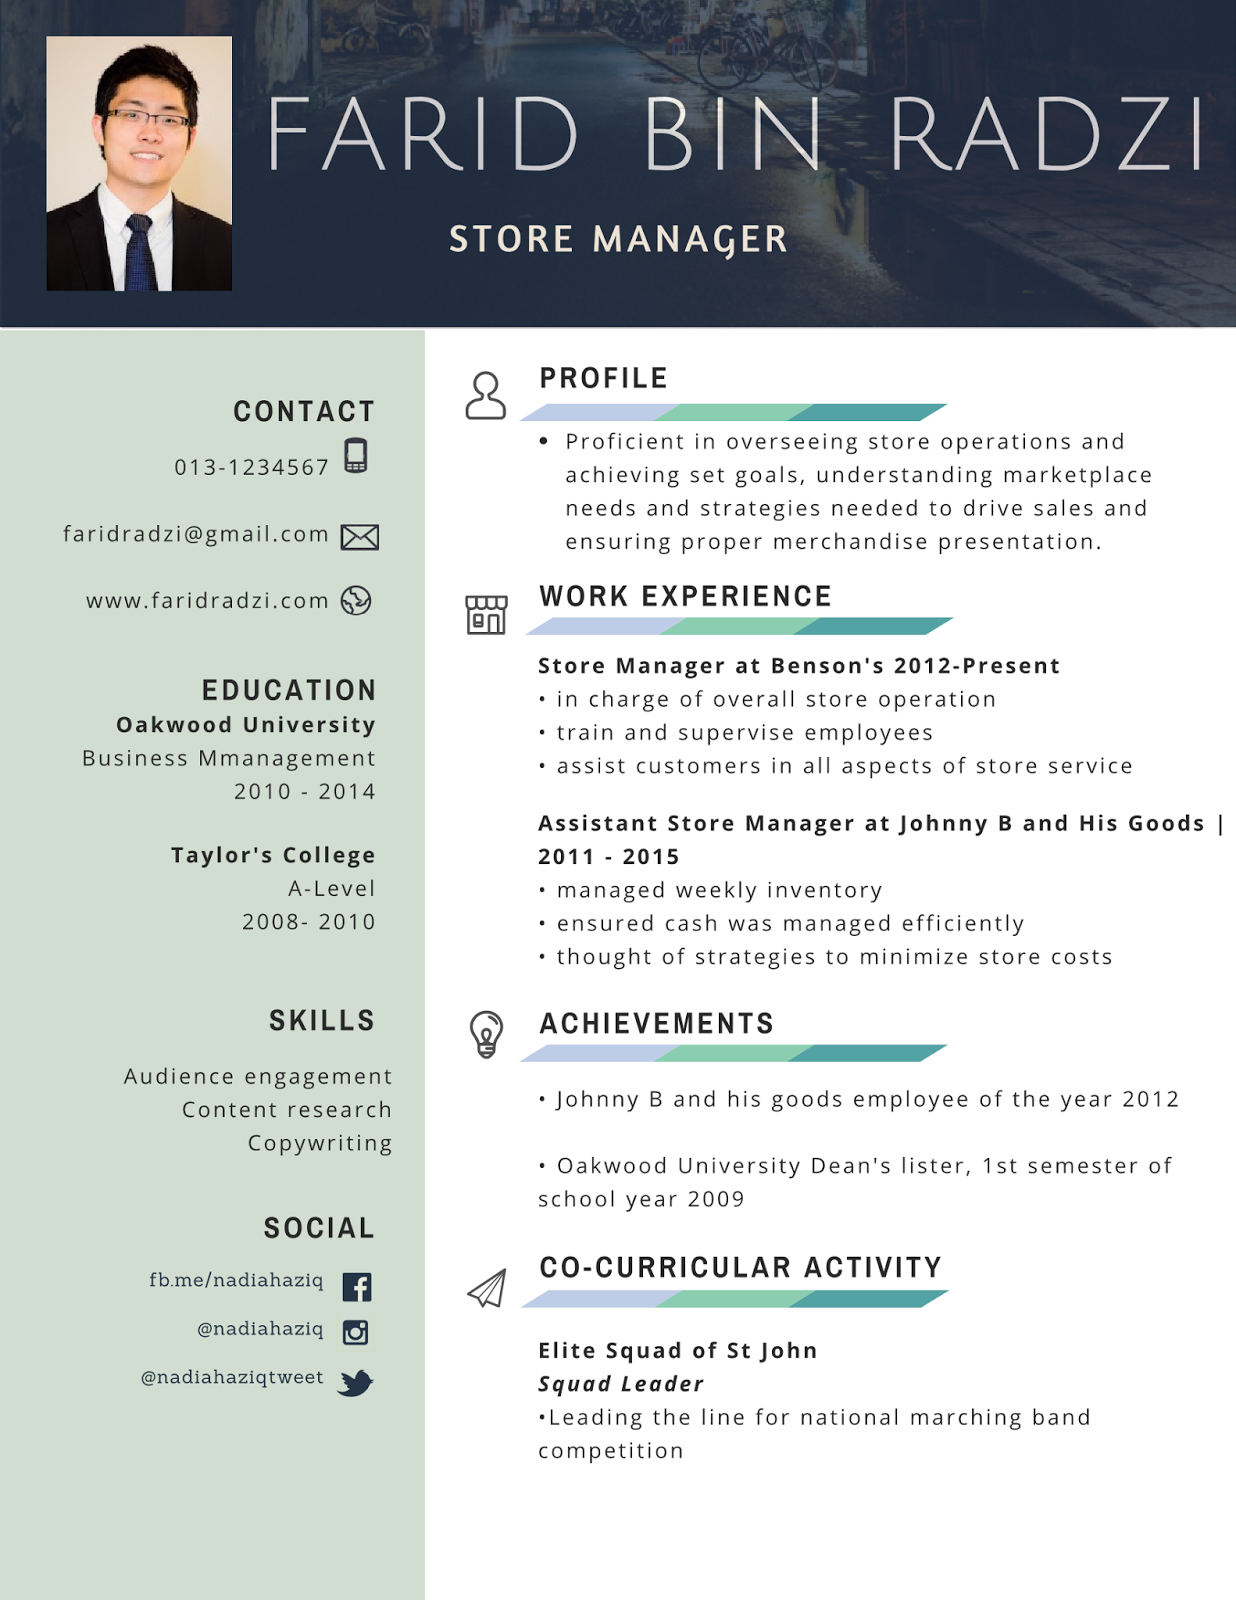 Contoh Resume Terbaik : contoh, resume, terbaik, Contoh, Resume, Terbaik, Lengkap, Terkini, Koleksi, Templates,, Folder,, Downloadable, Template